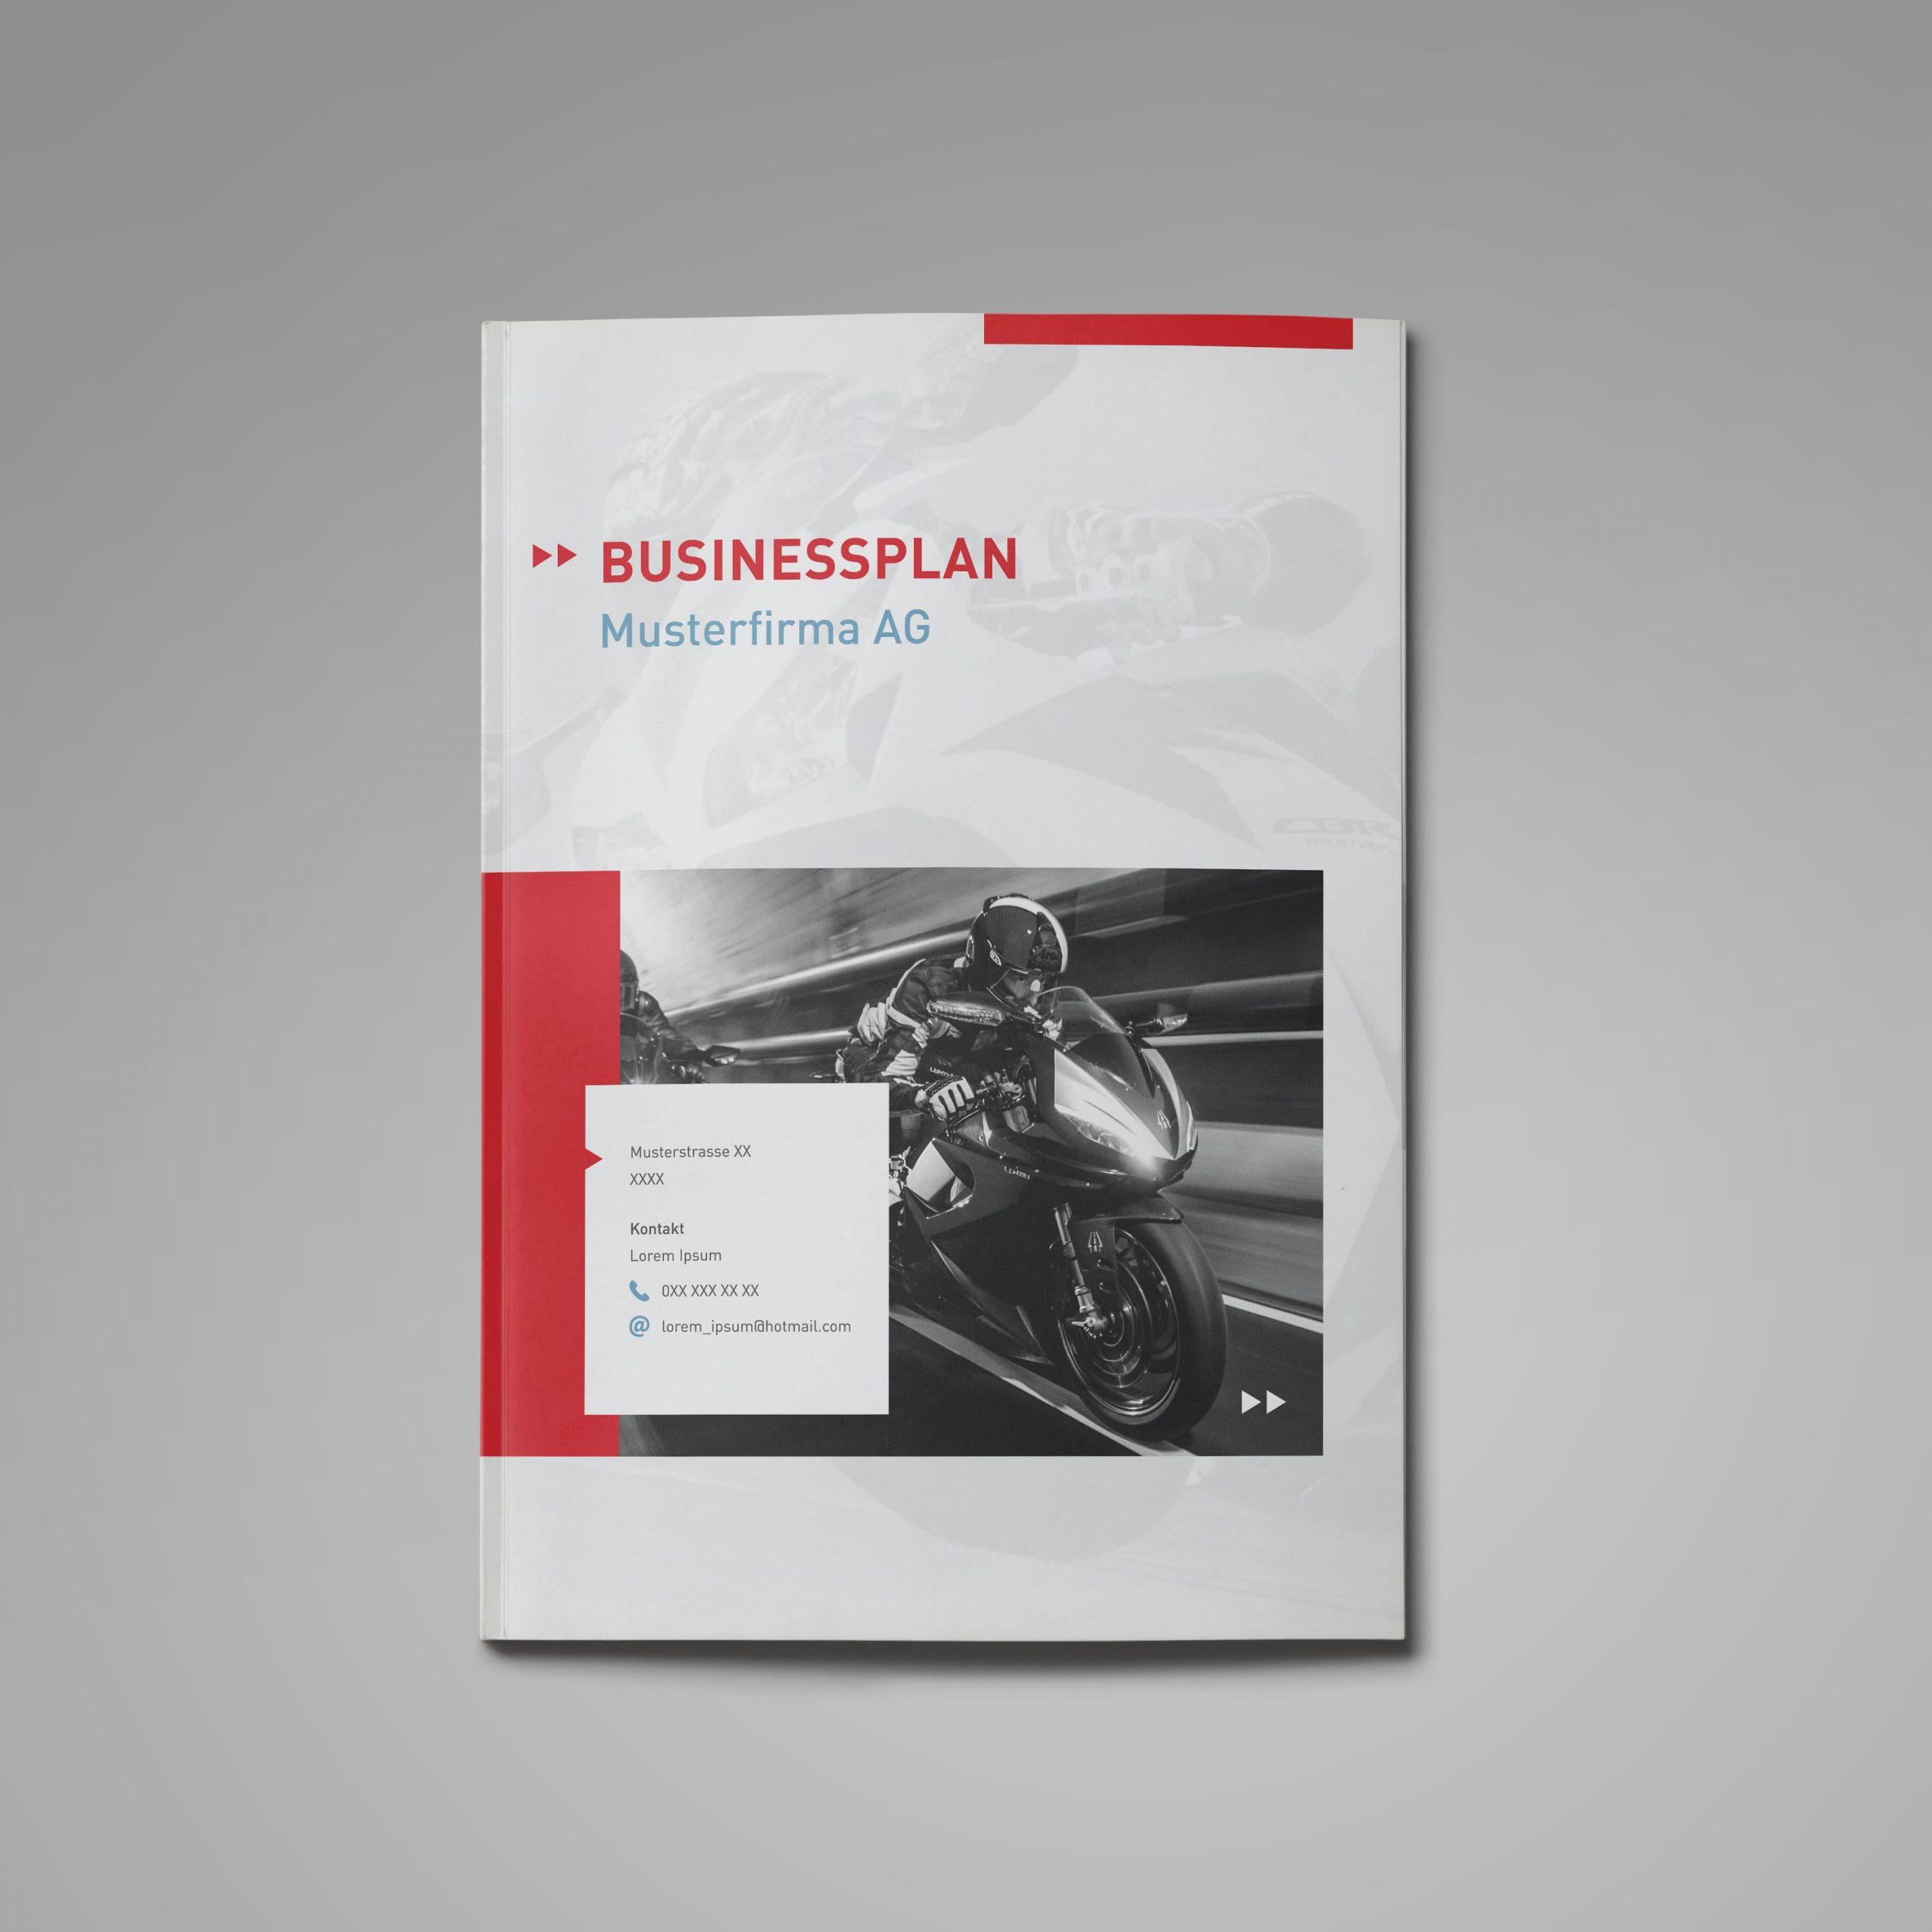 Motorradhandel Businessplan